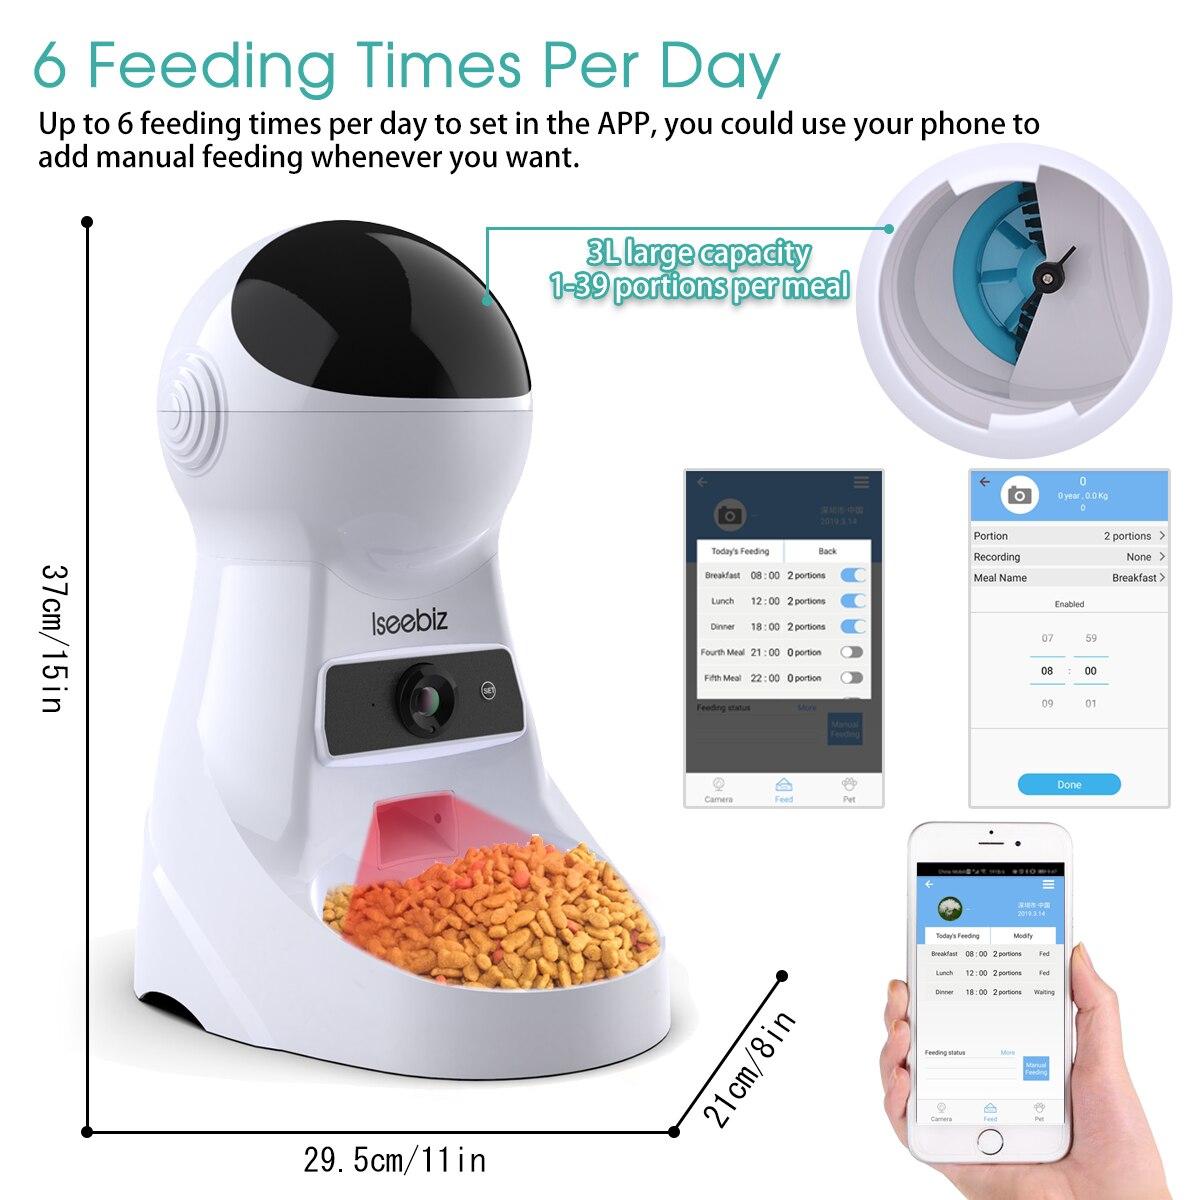 Iseebiz 3L Automatic Pet Feeder With Voice Record Pets food Bowl 27 » Pets Impress